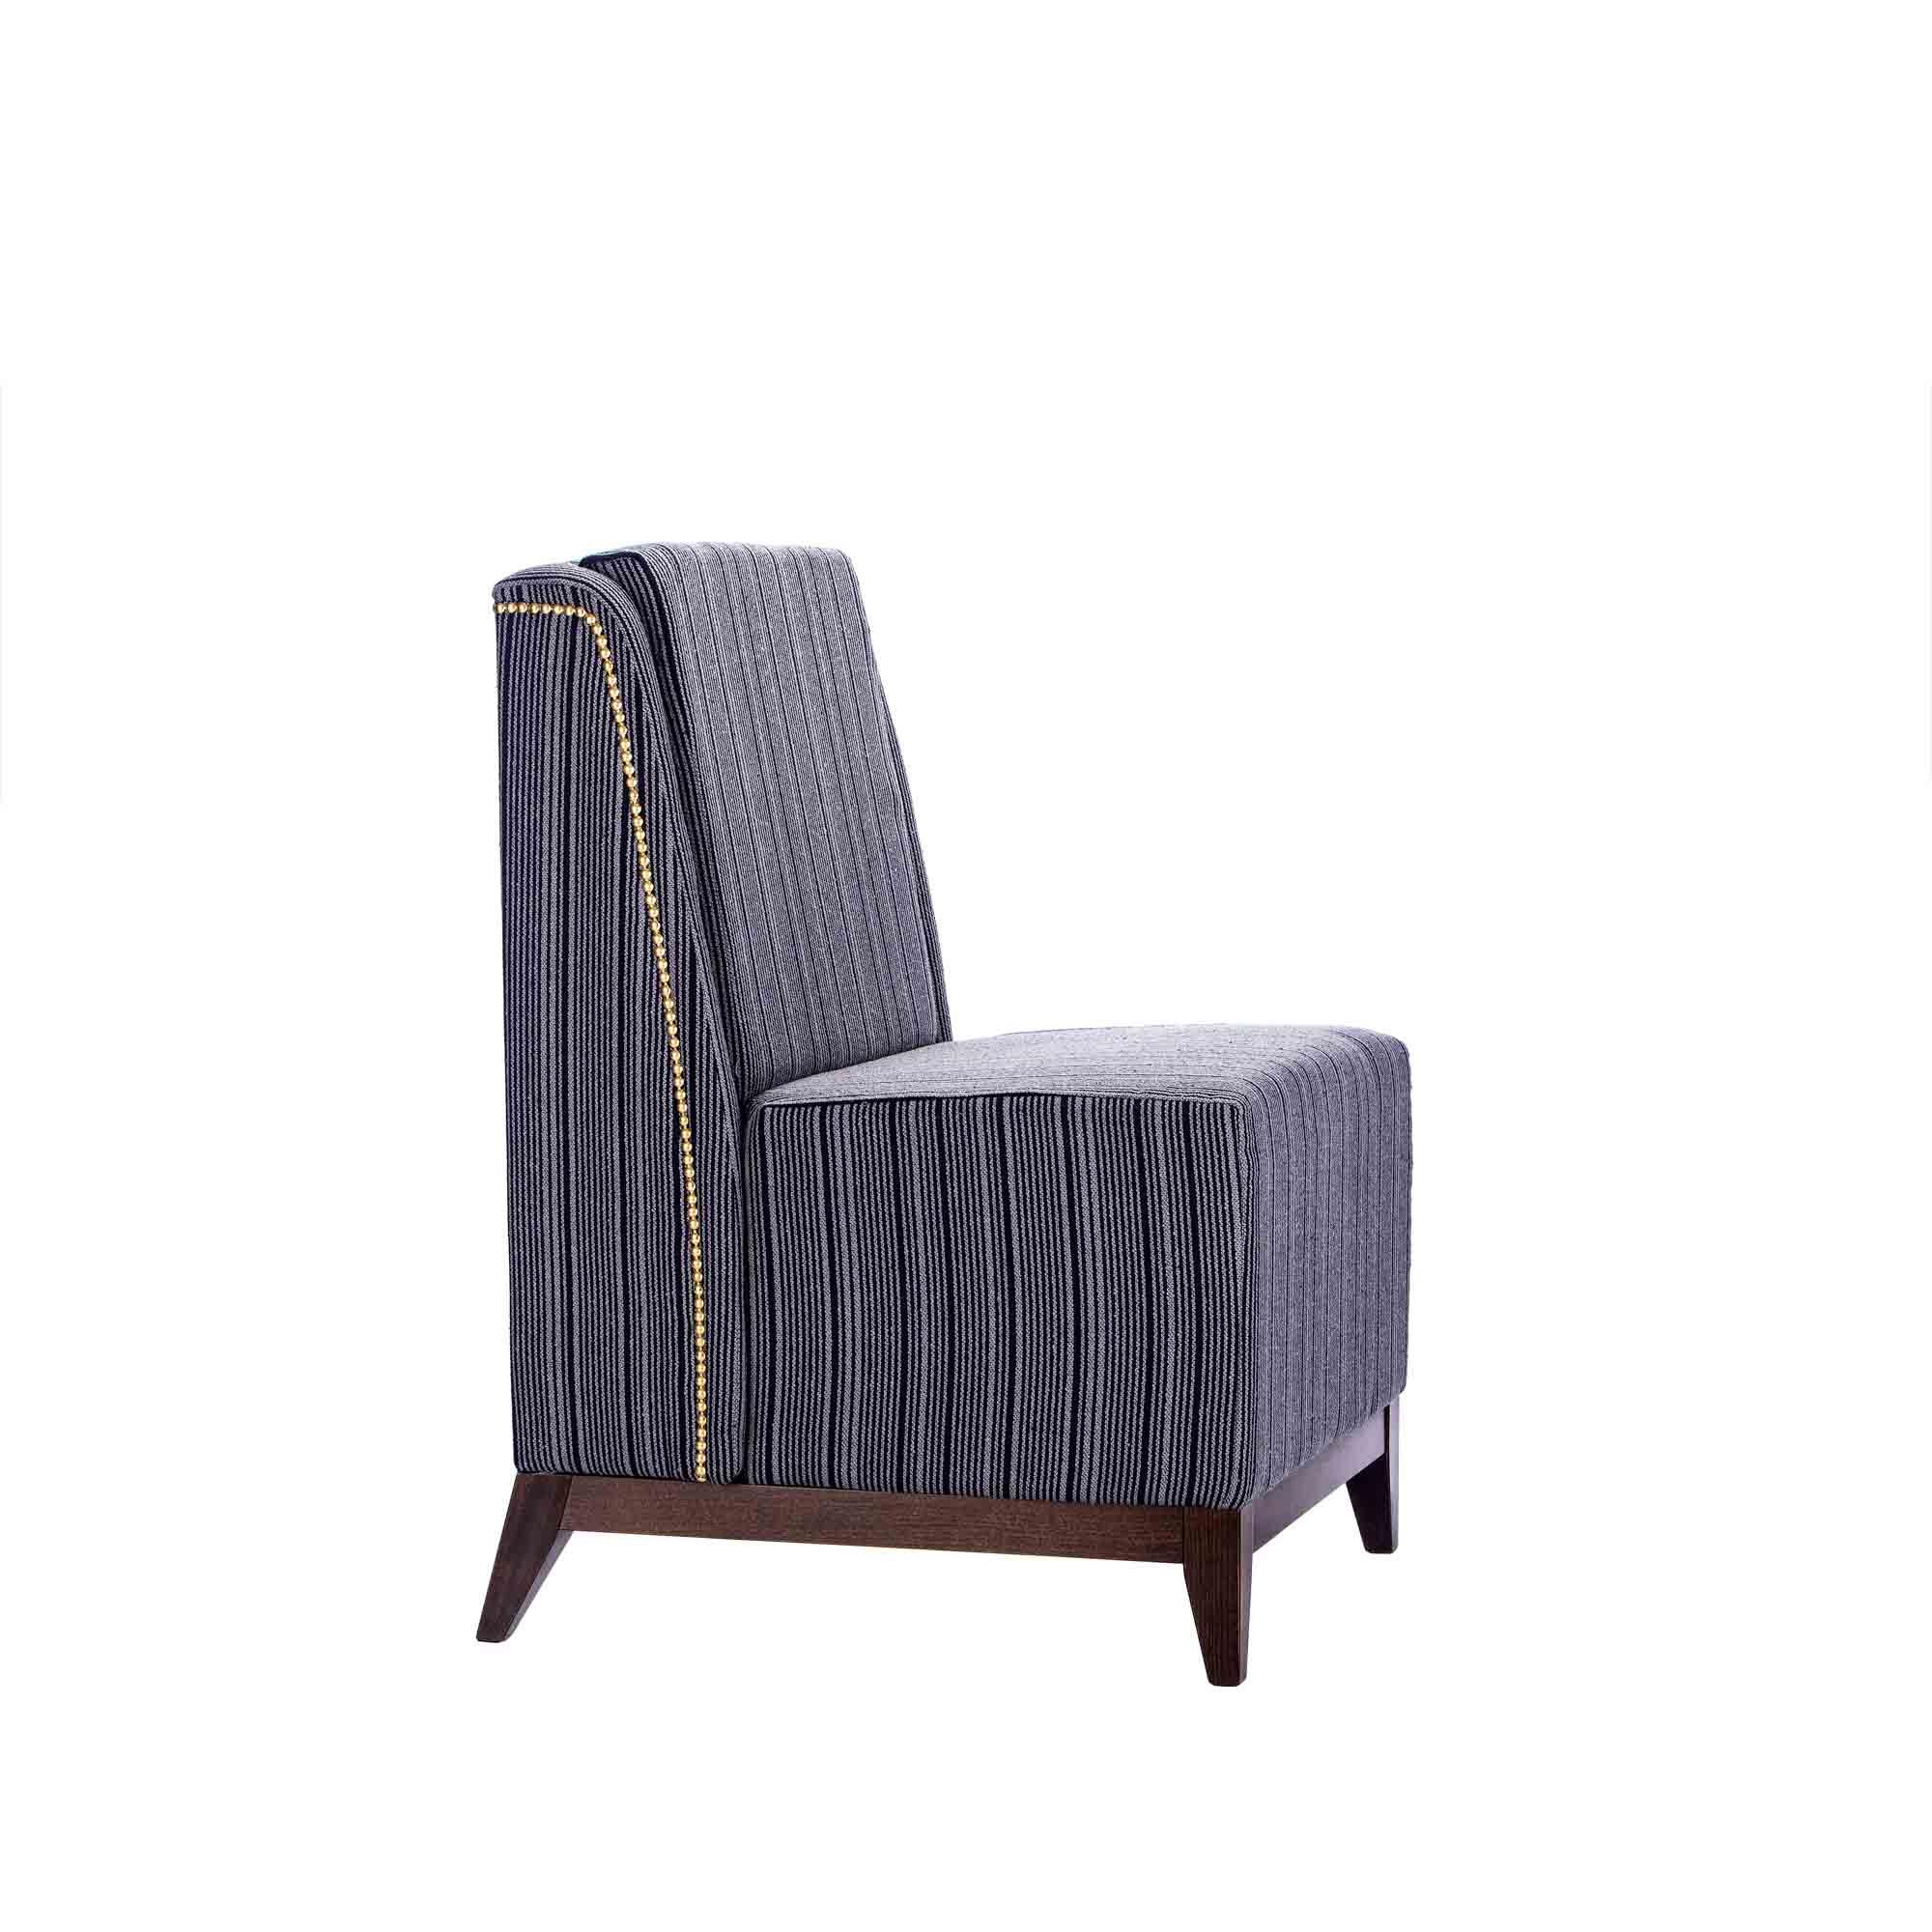 Alba Lounge Bros Monaghan Chair Bros Alba Lounge Monaghan Chair ZNn0wXk8OP